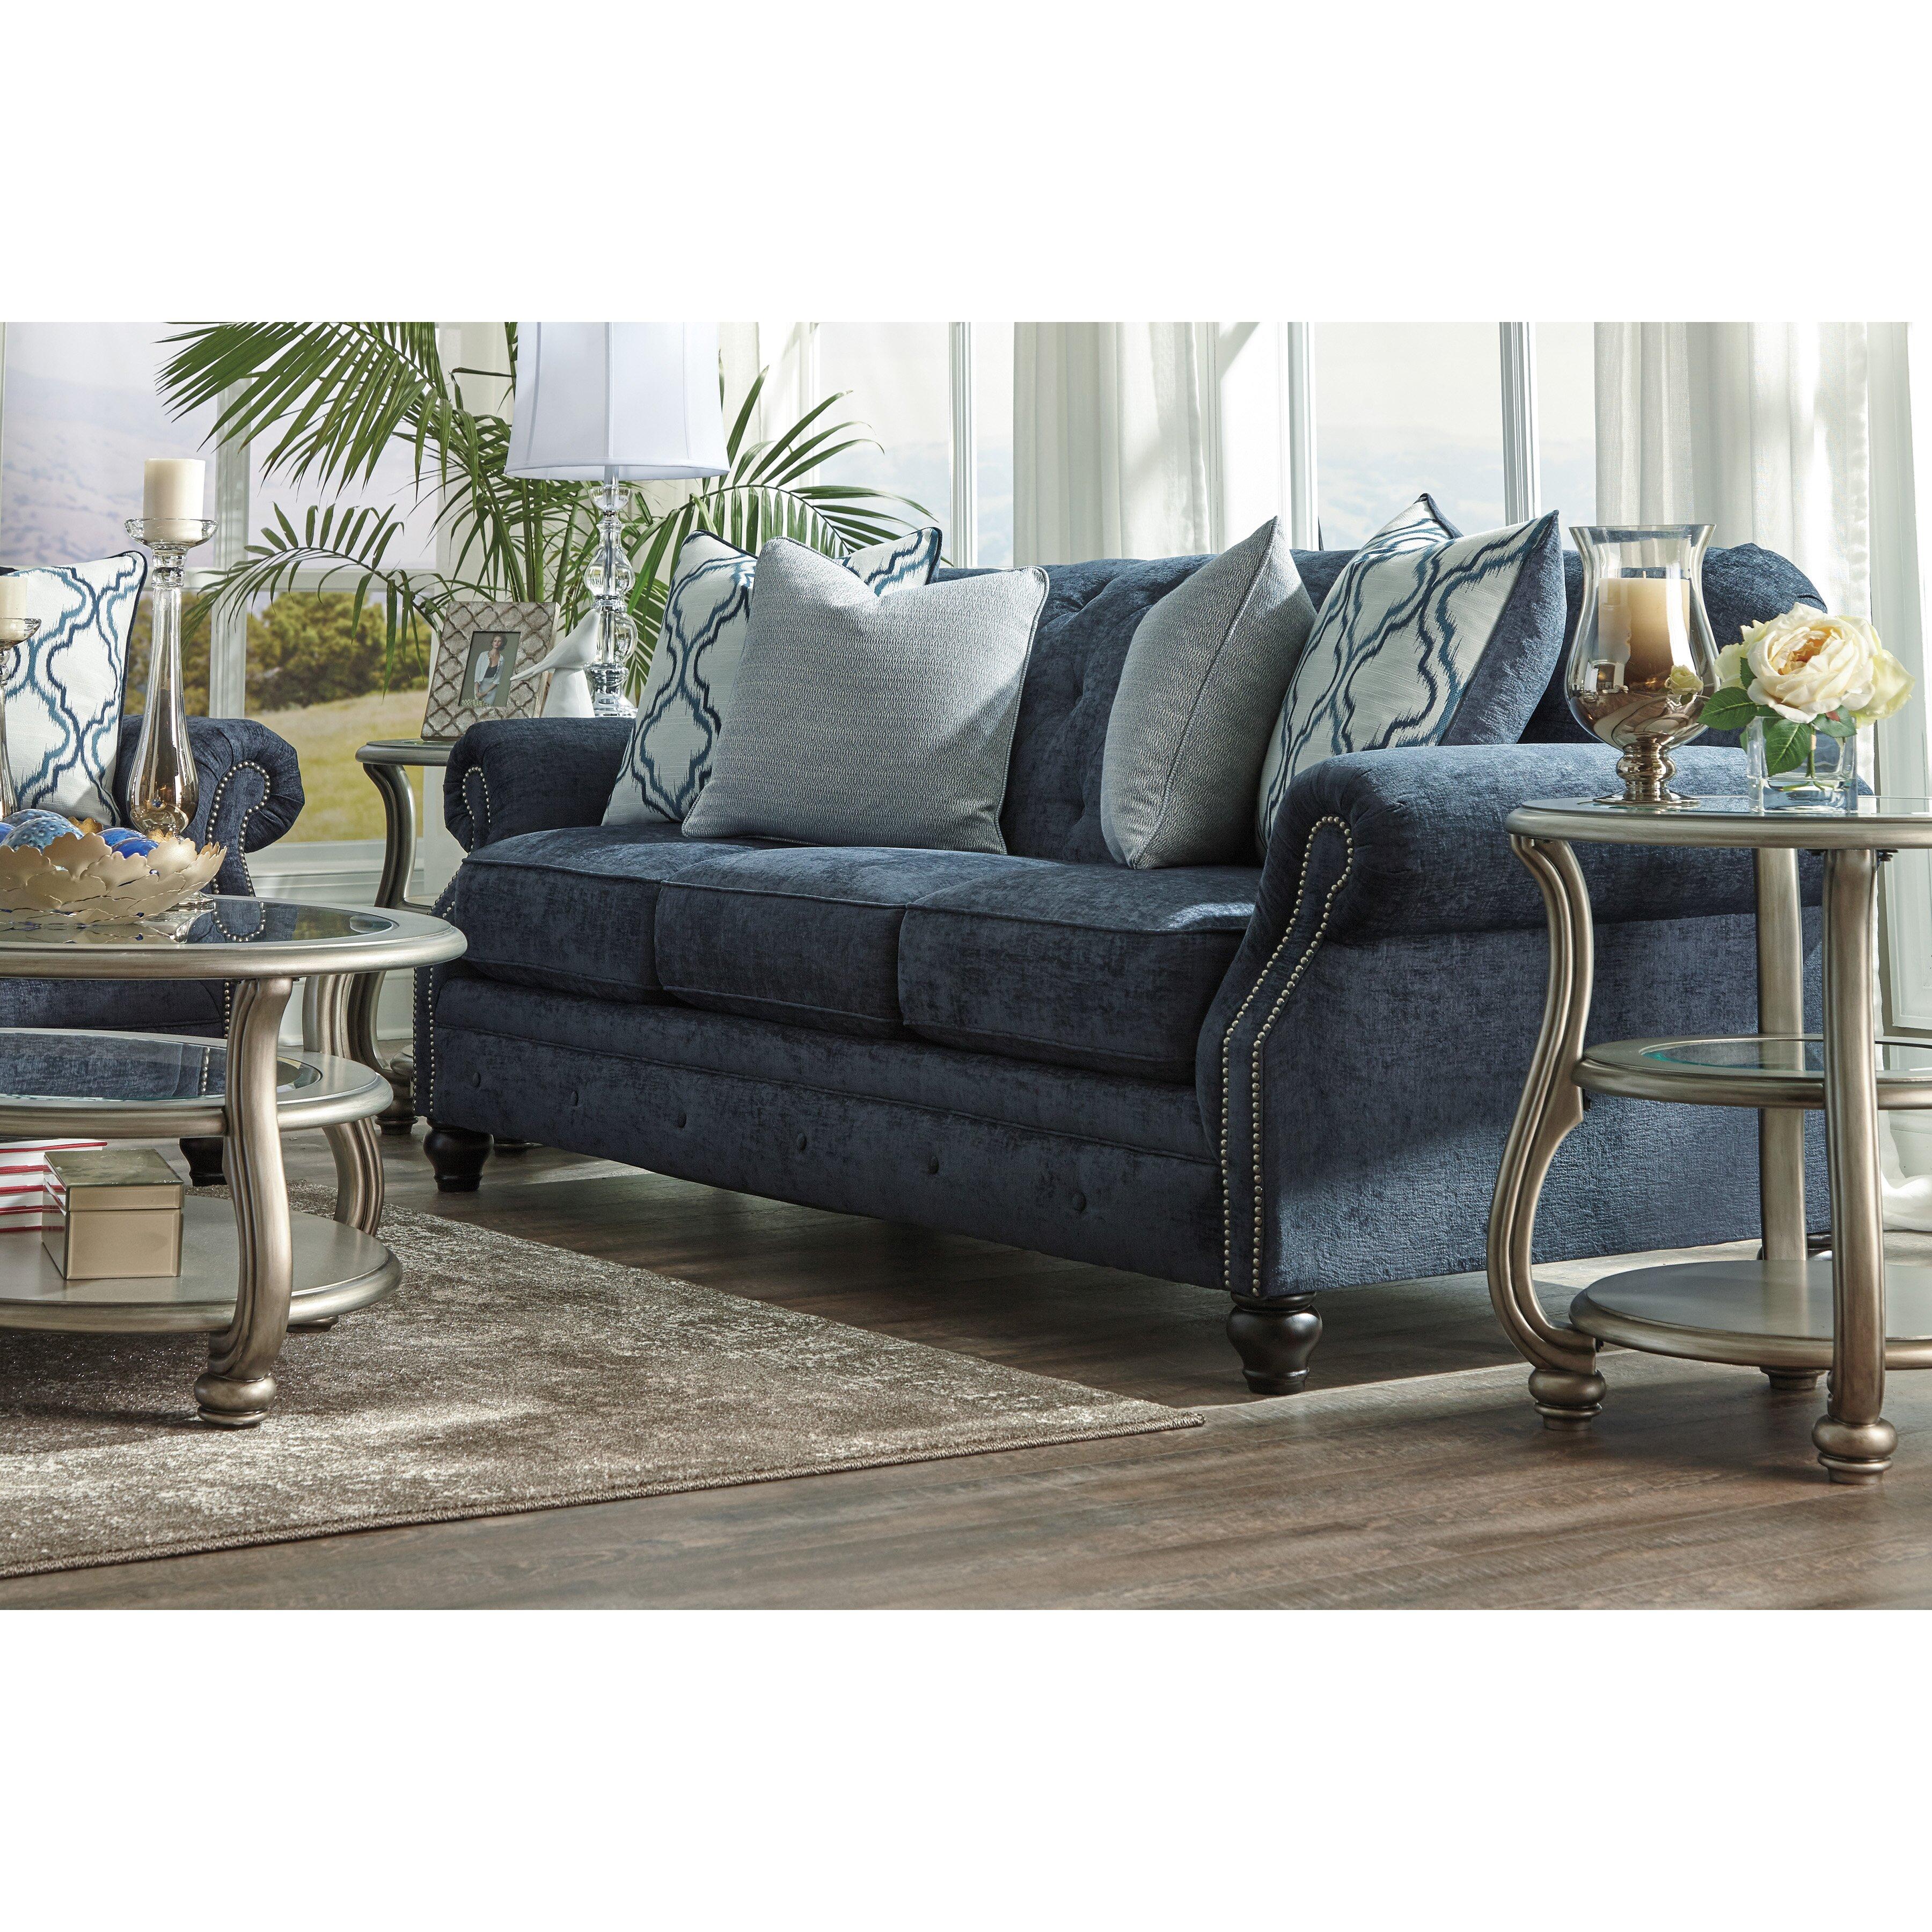 benchcraft lavernia sofa reviews wayfair peyton sofa ashley